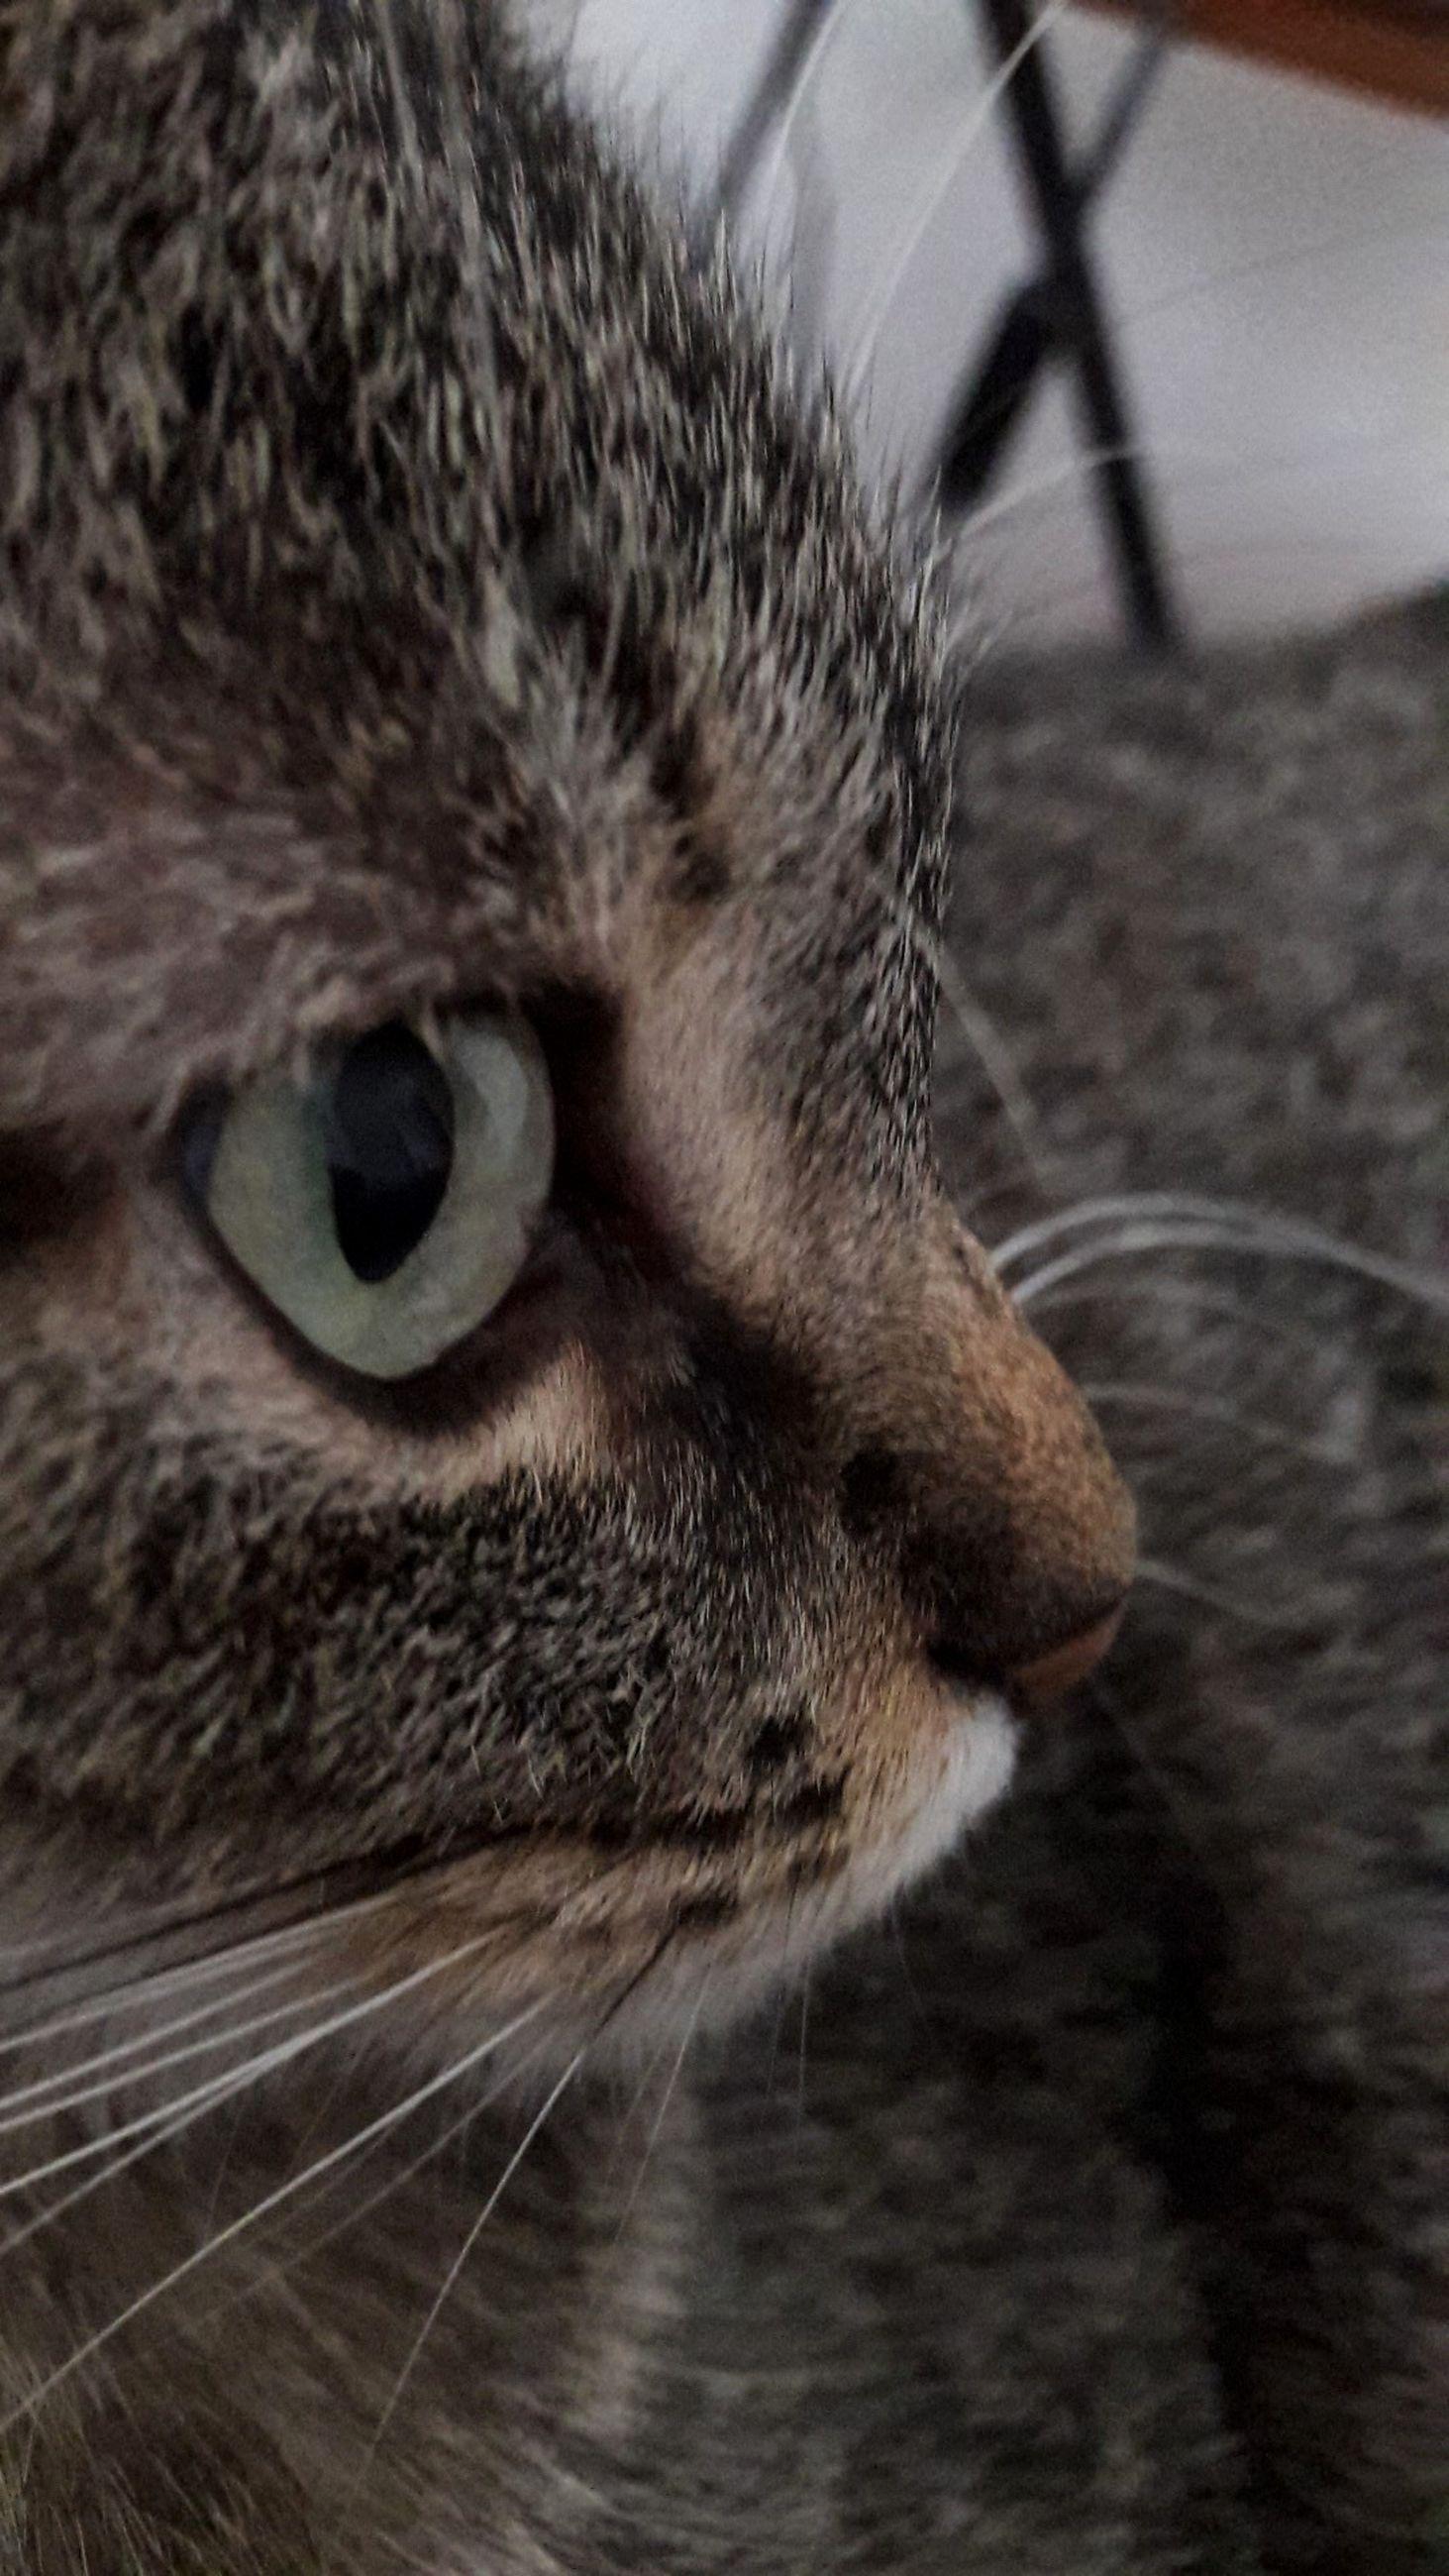 one animal, domestic cat, domestic animals, pets, animal themes, mammal, feline, close-up, animal head, cat, no people, animal eye, indoors, yellow eyes, day